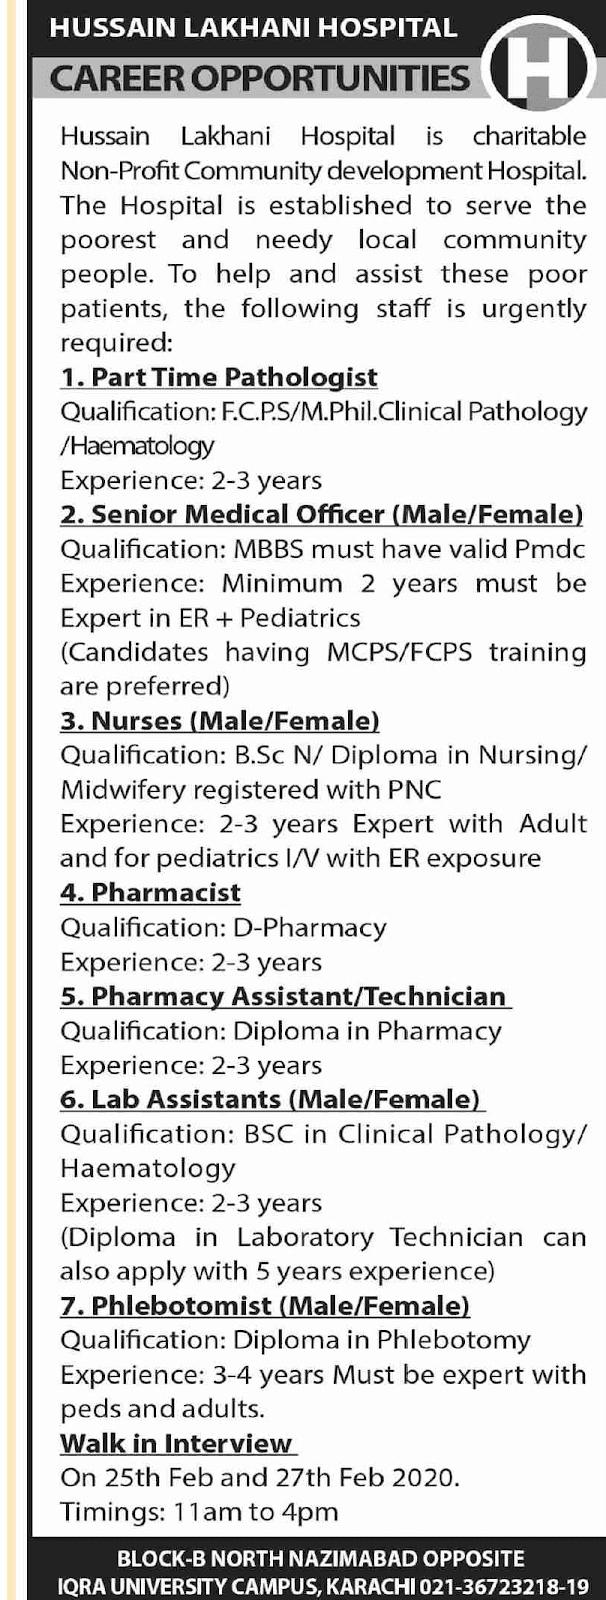 Jobs in Hussain Lakhani Hospital Latest 2020